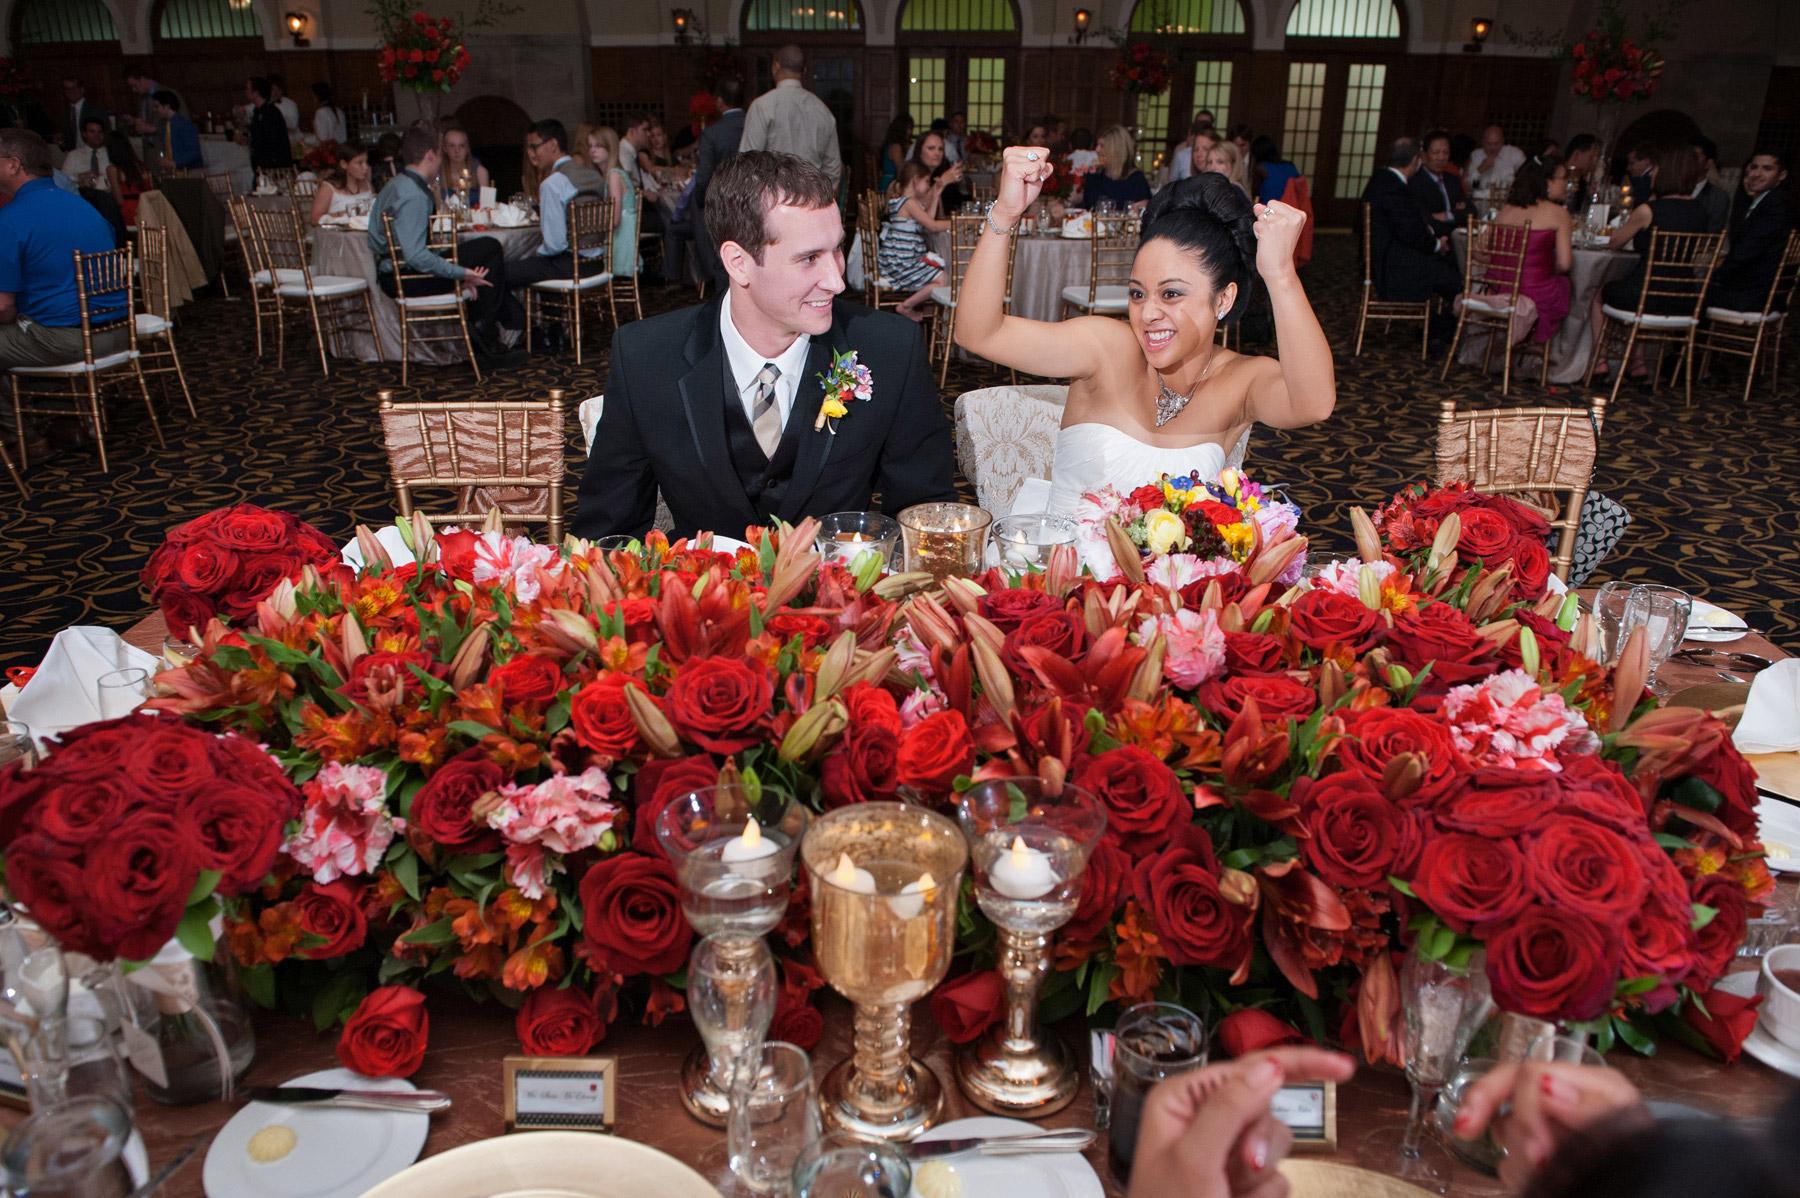 wedding-photography-saint-paul-mark-kegans-640.jpg